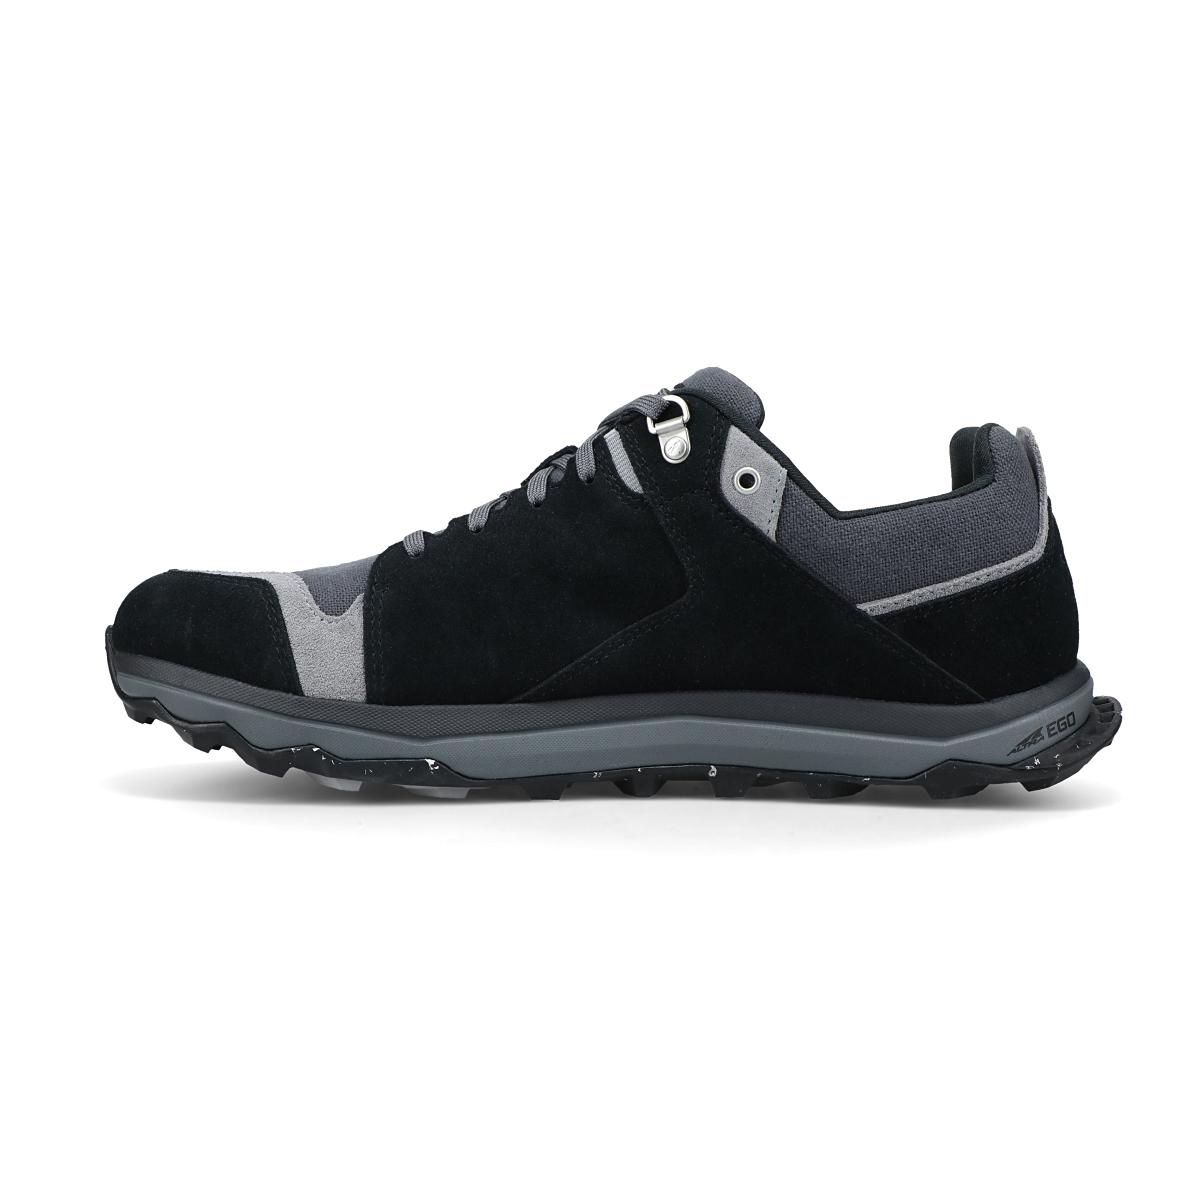 Men's Altra Lone Peak Alpine Trail Running Shoe - Color: Black - Size: 7 - Width: Regular, Black, large, image 2